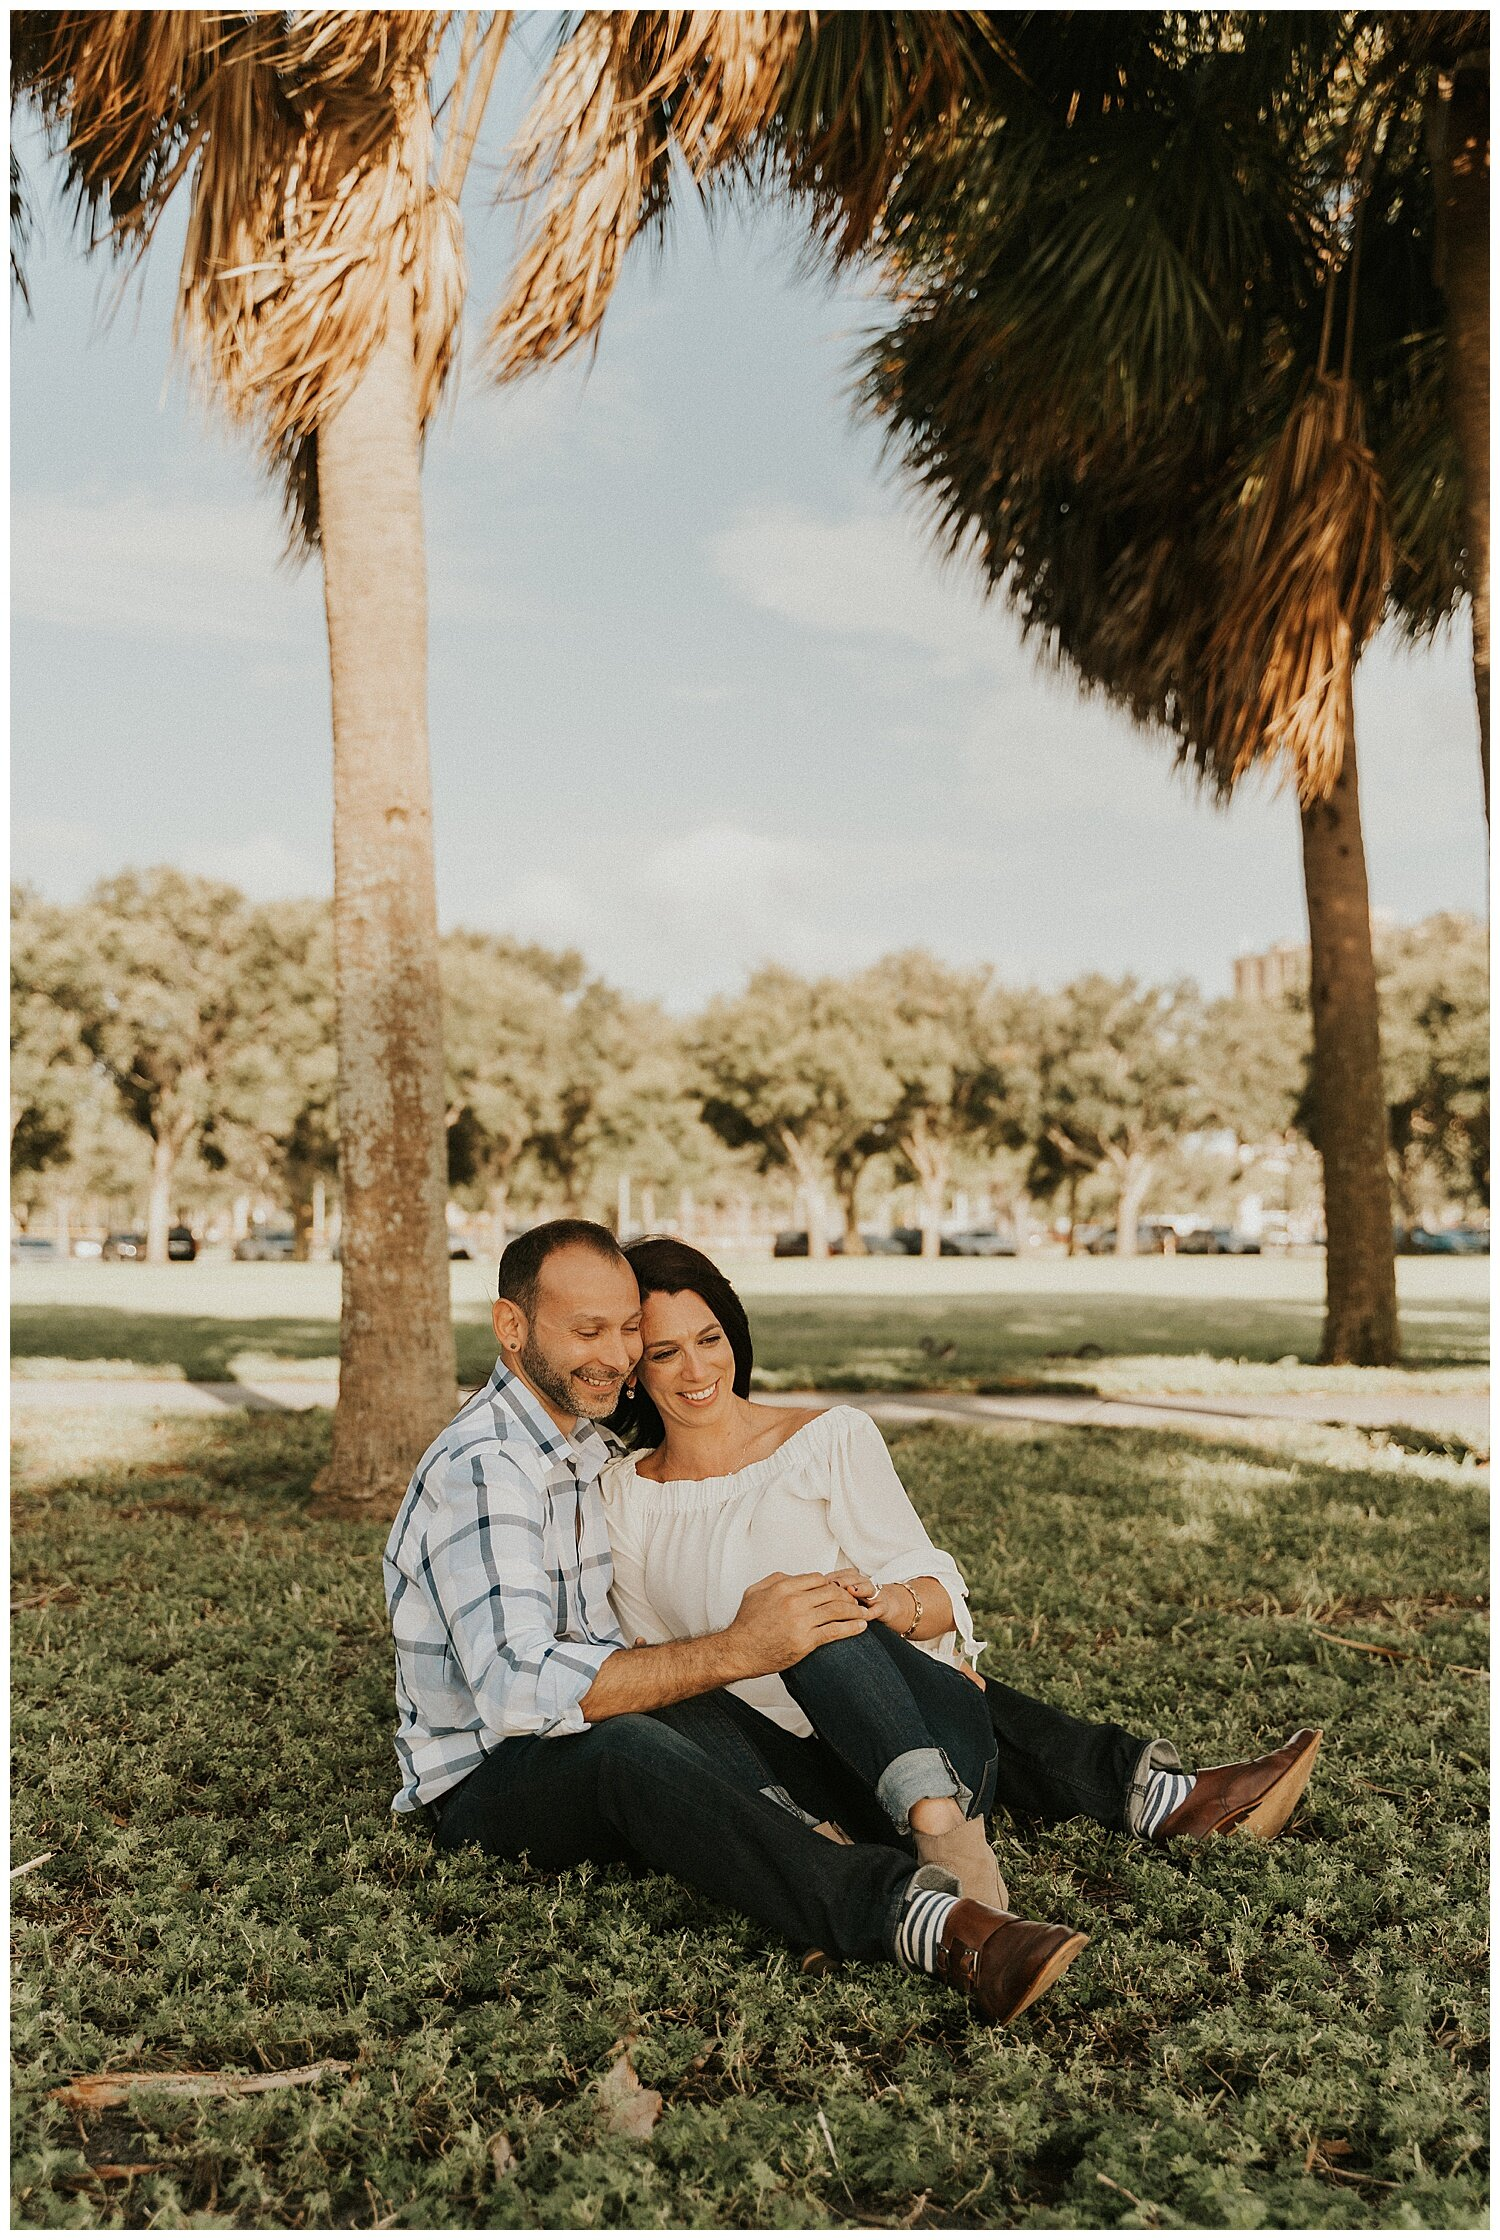 florida-wedding-photographer-tampa-engagement-photographer-st.pete-engagement-photographer-lens-culture-photographer-12.jpg